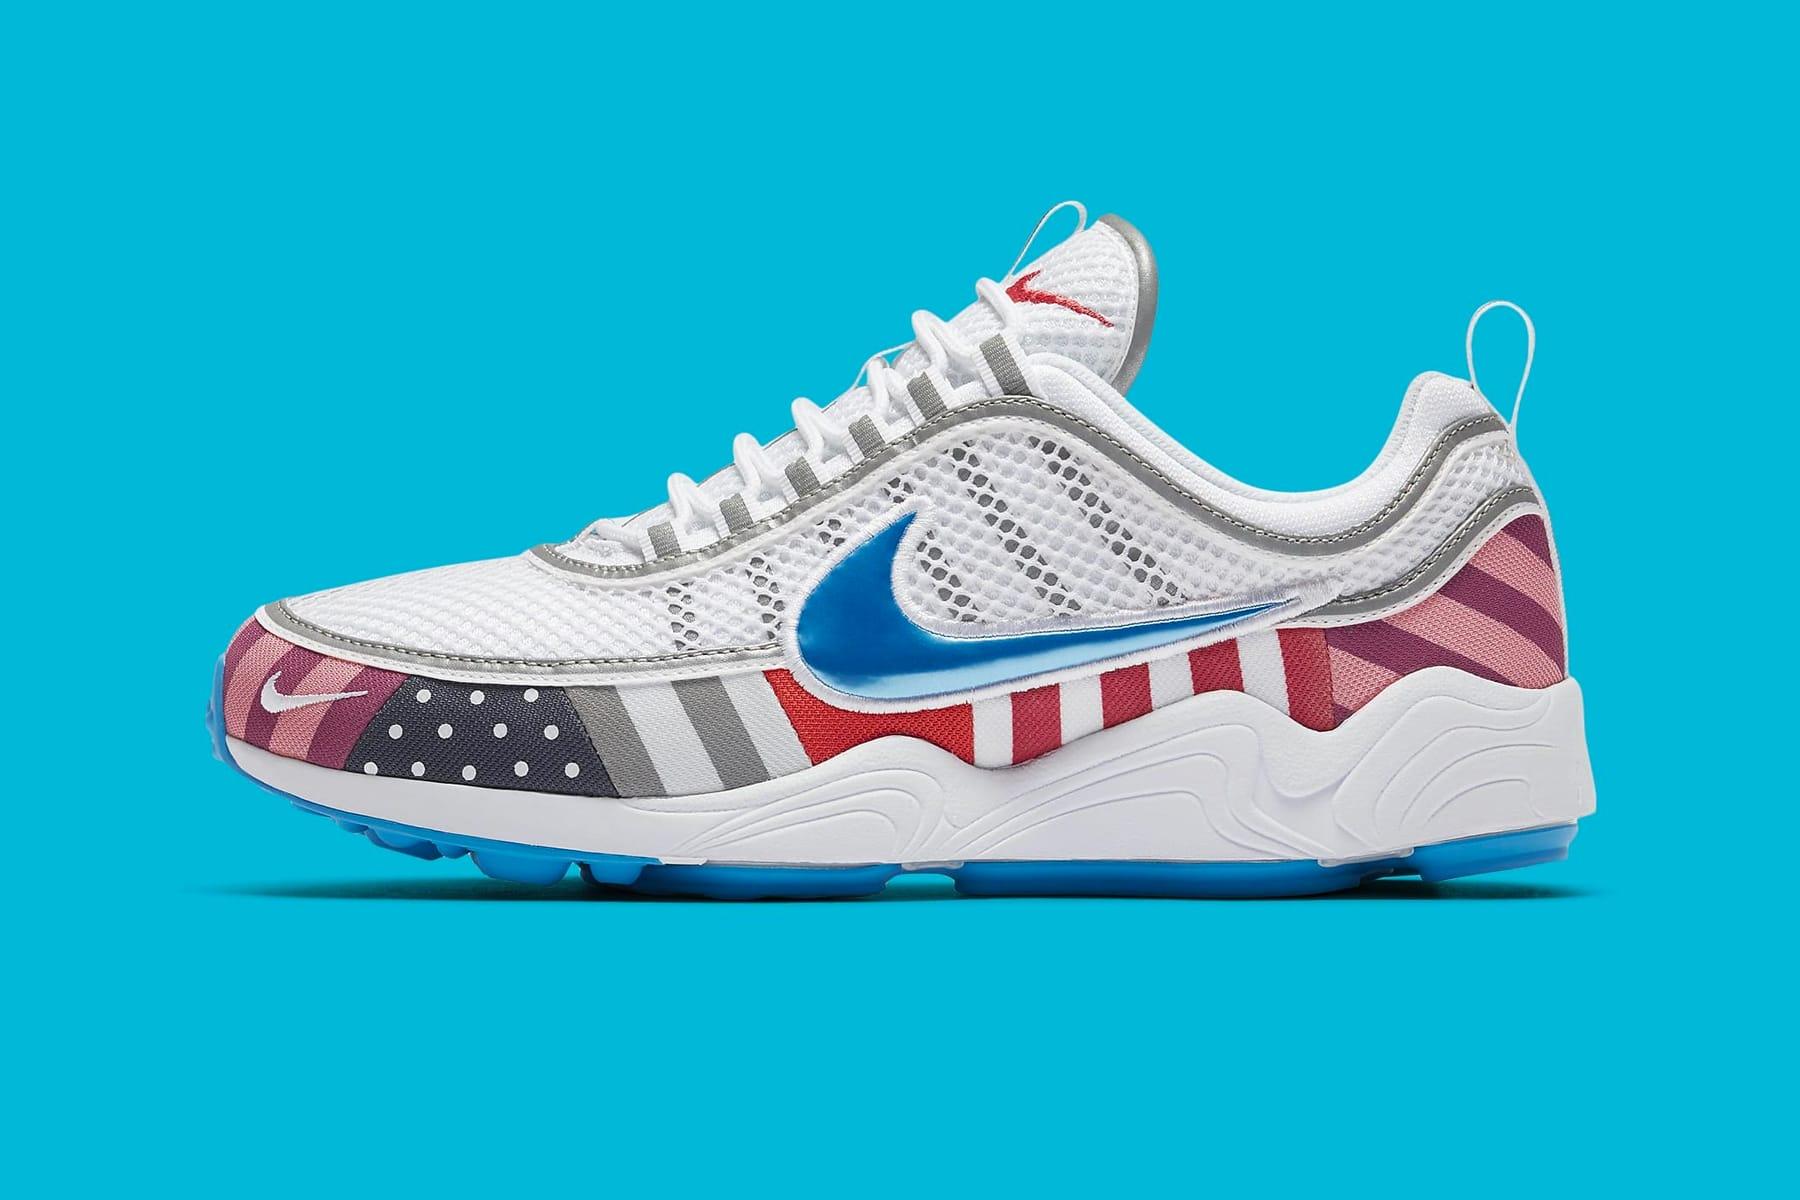 Parra x Nike Air Zoom Spiridon Official